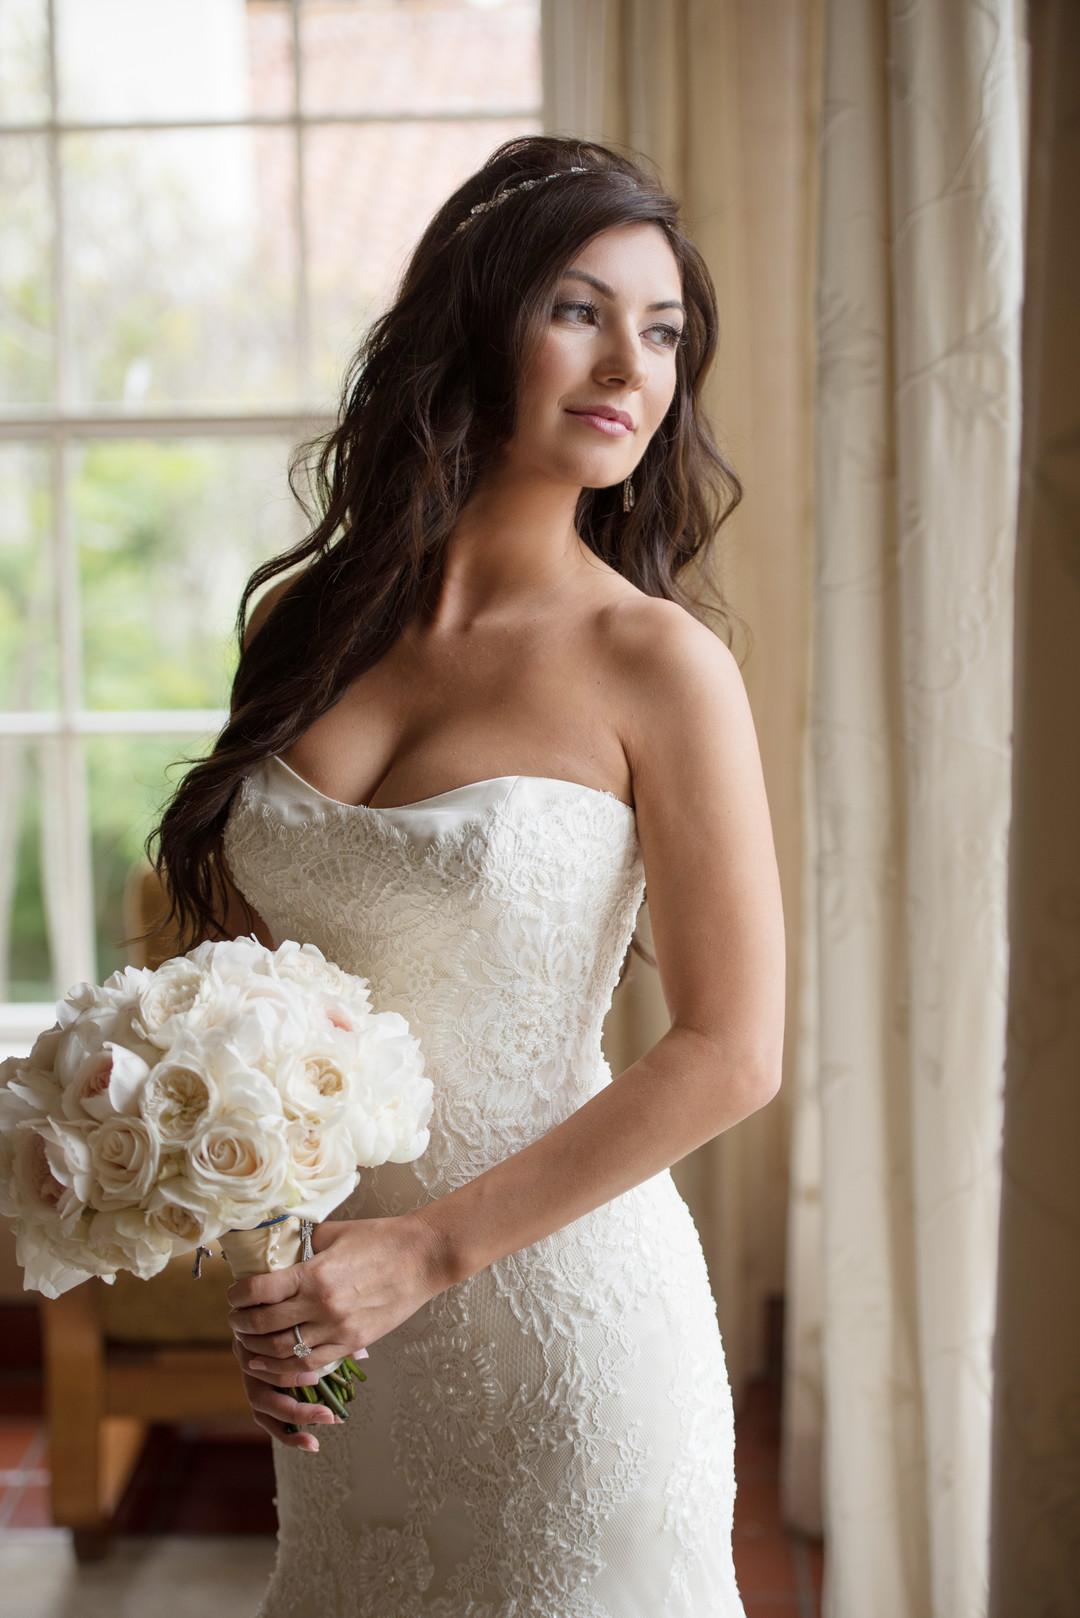 www.santabarbarawedding.com   The Big Affair   Four Seasons The Biltmore Santa Barbara   Asiel Designs   Bridal Portrait